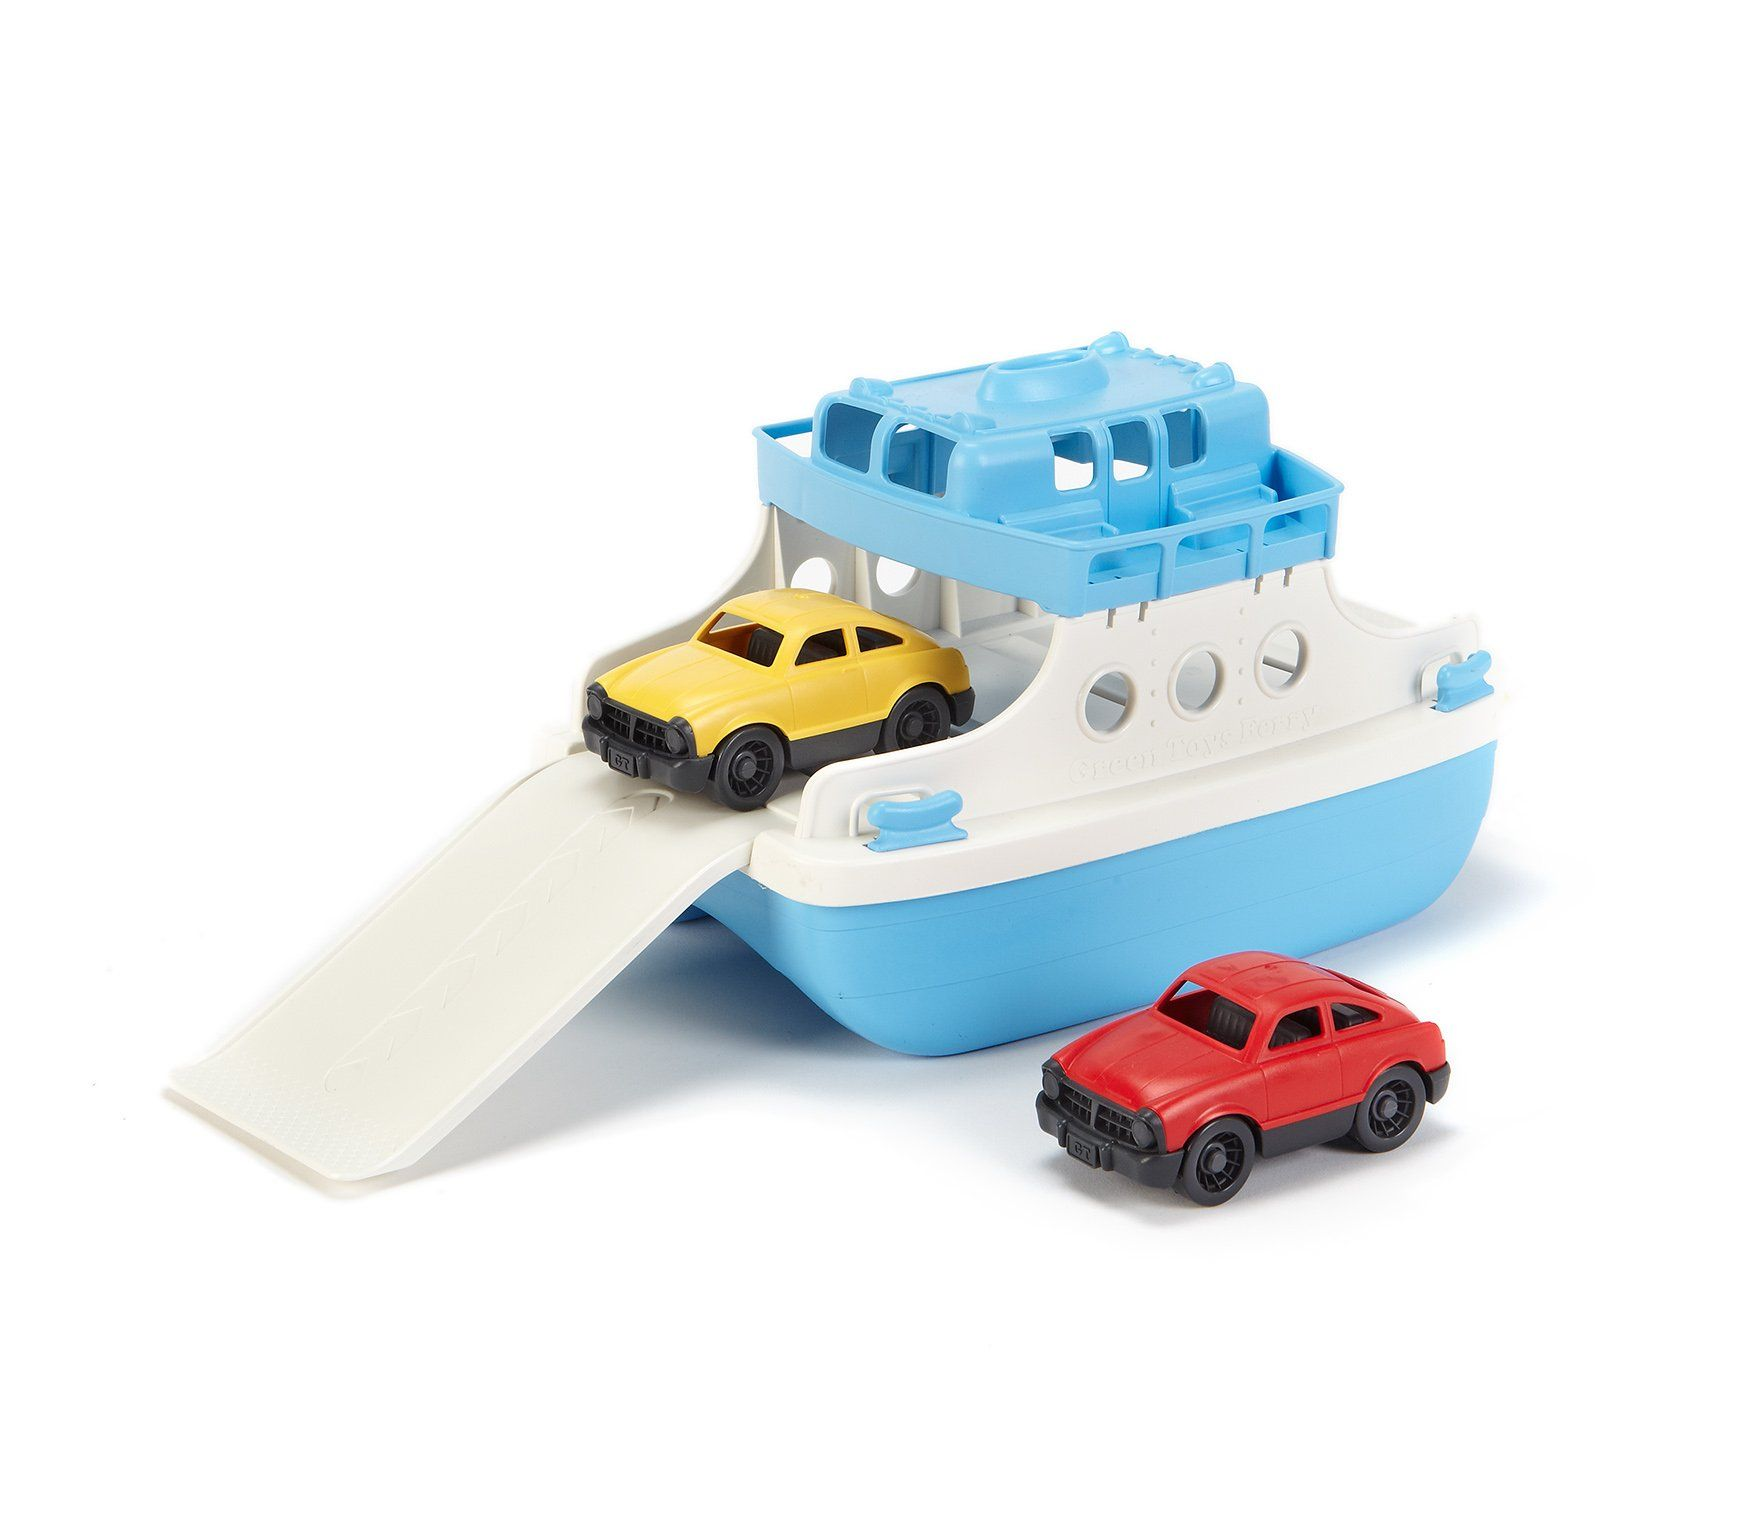 Amazon.com: Green Toys Ferry Boat with Mini Cars Bathtub Toy, Blue ...